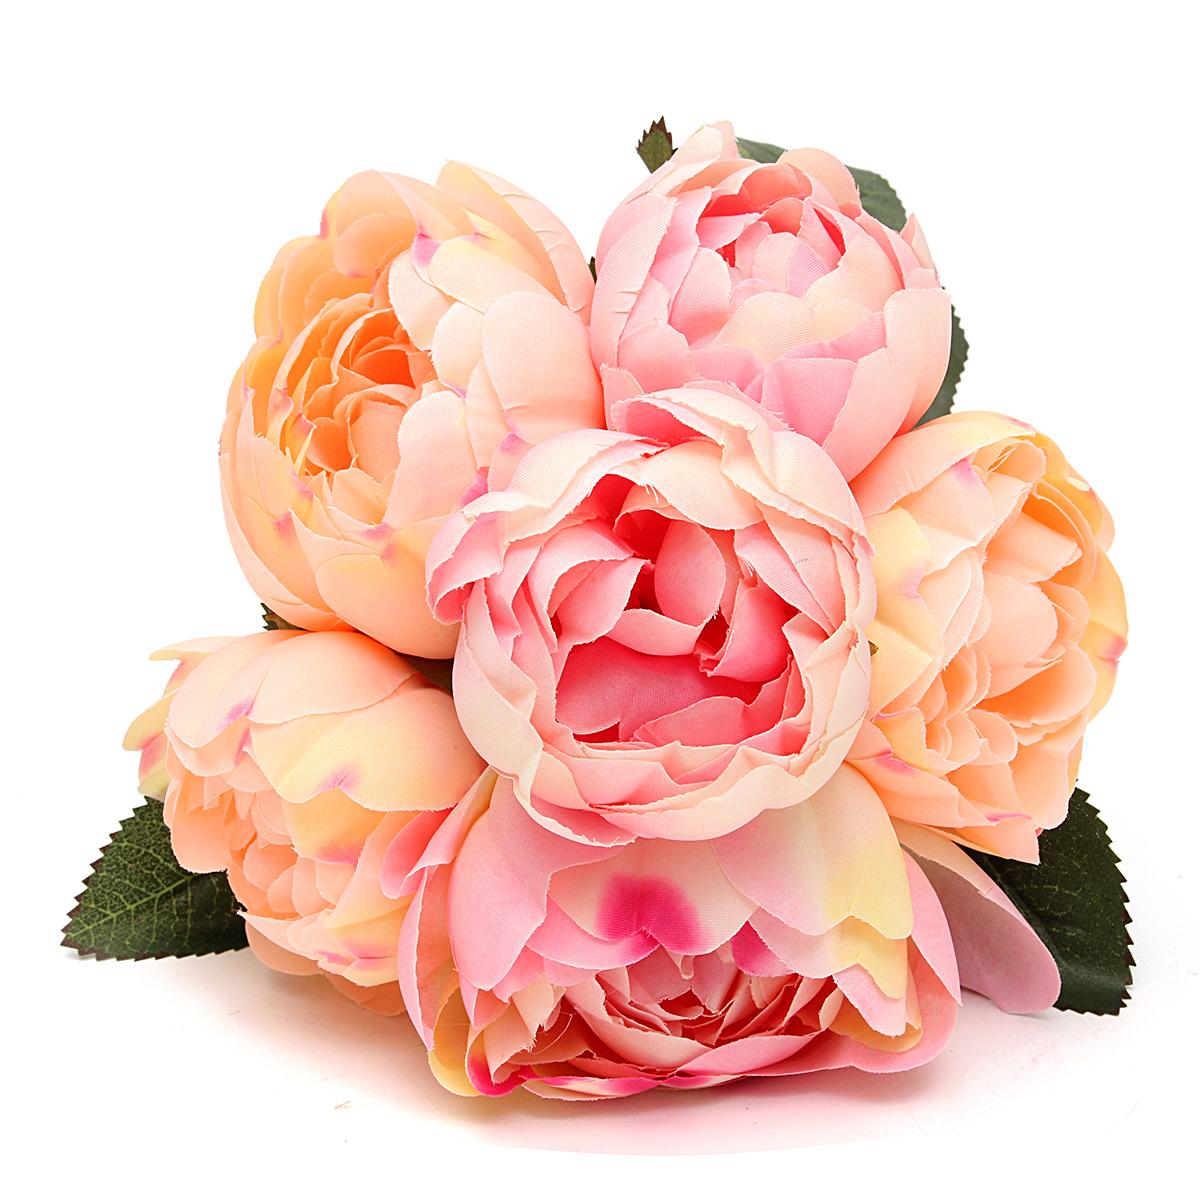 6Pcs/Pack Artificial Fake Peony Silk Flower Bridal Hydrangea Home Wedding Garden Decoration